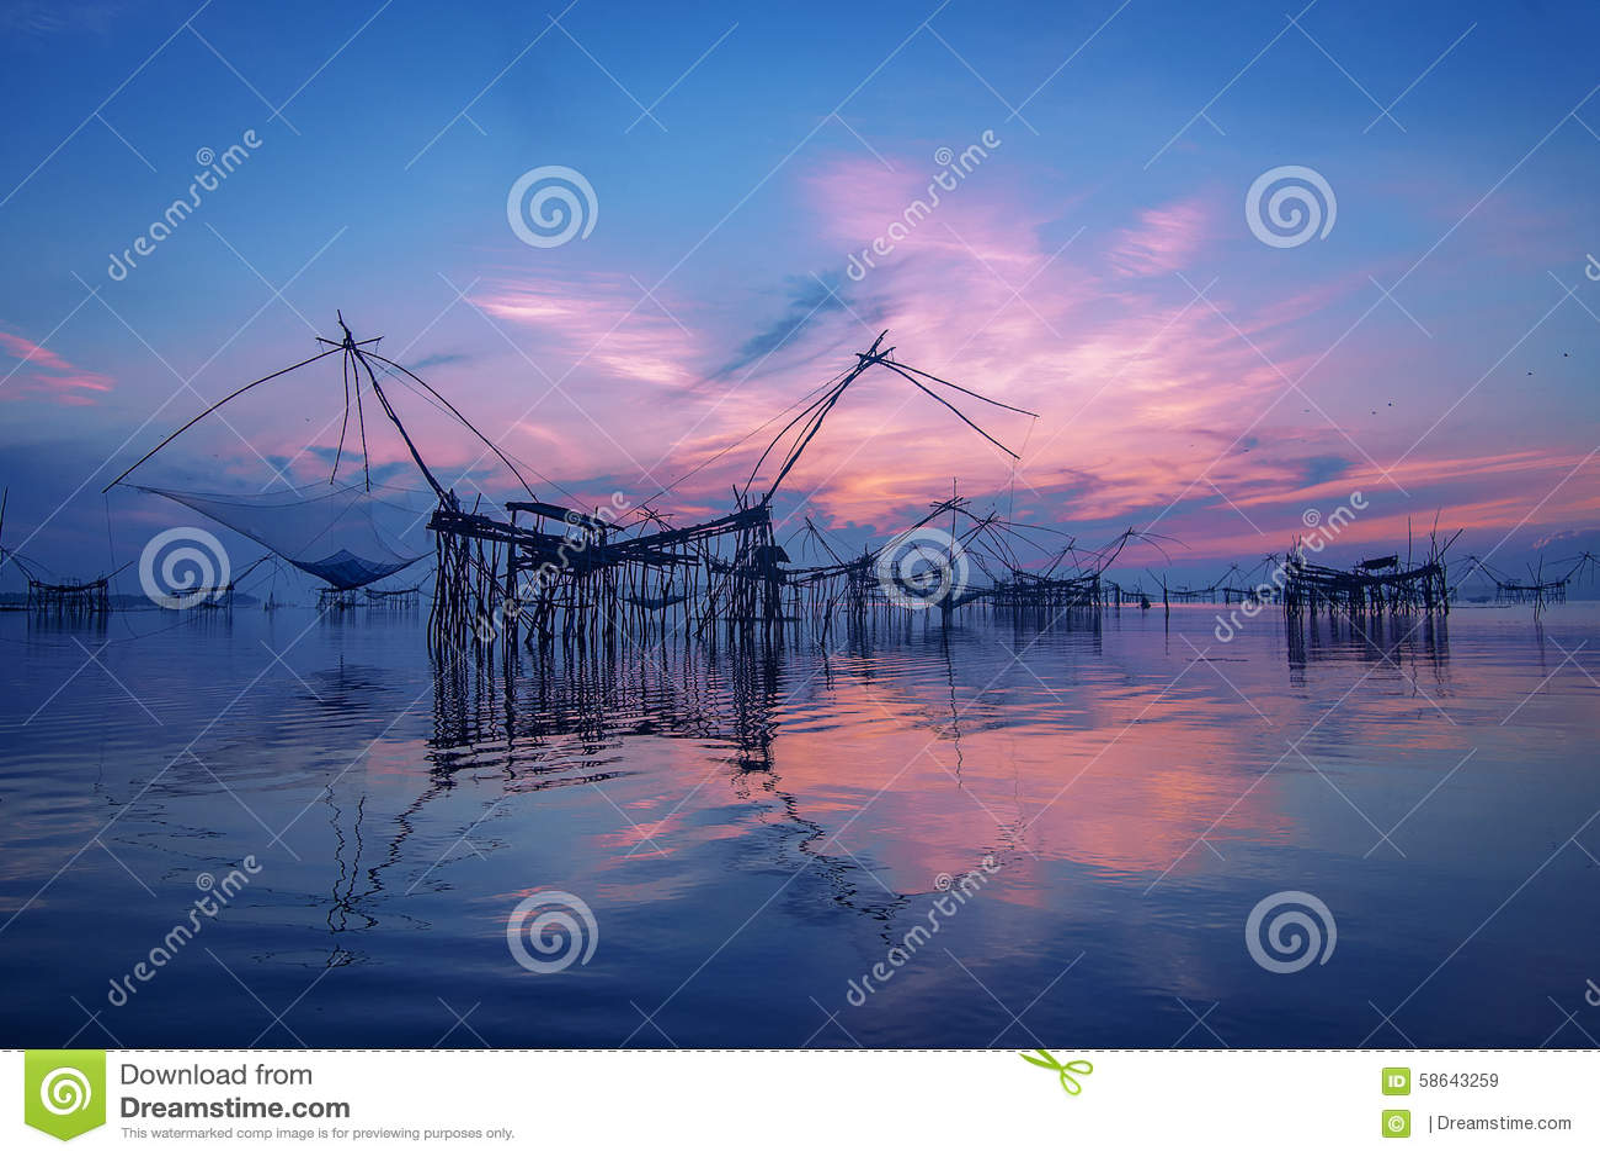 Square dip net stock photo image 58643259 for Fish river tree farm